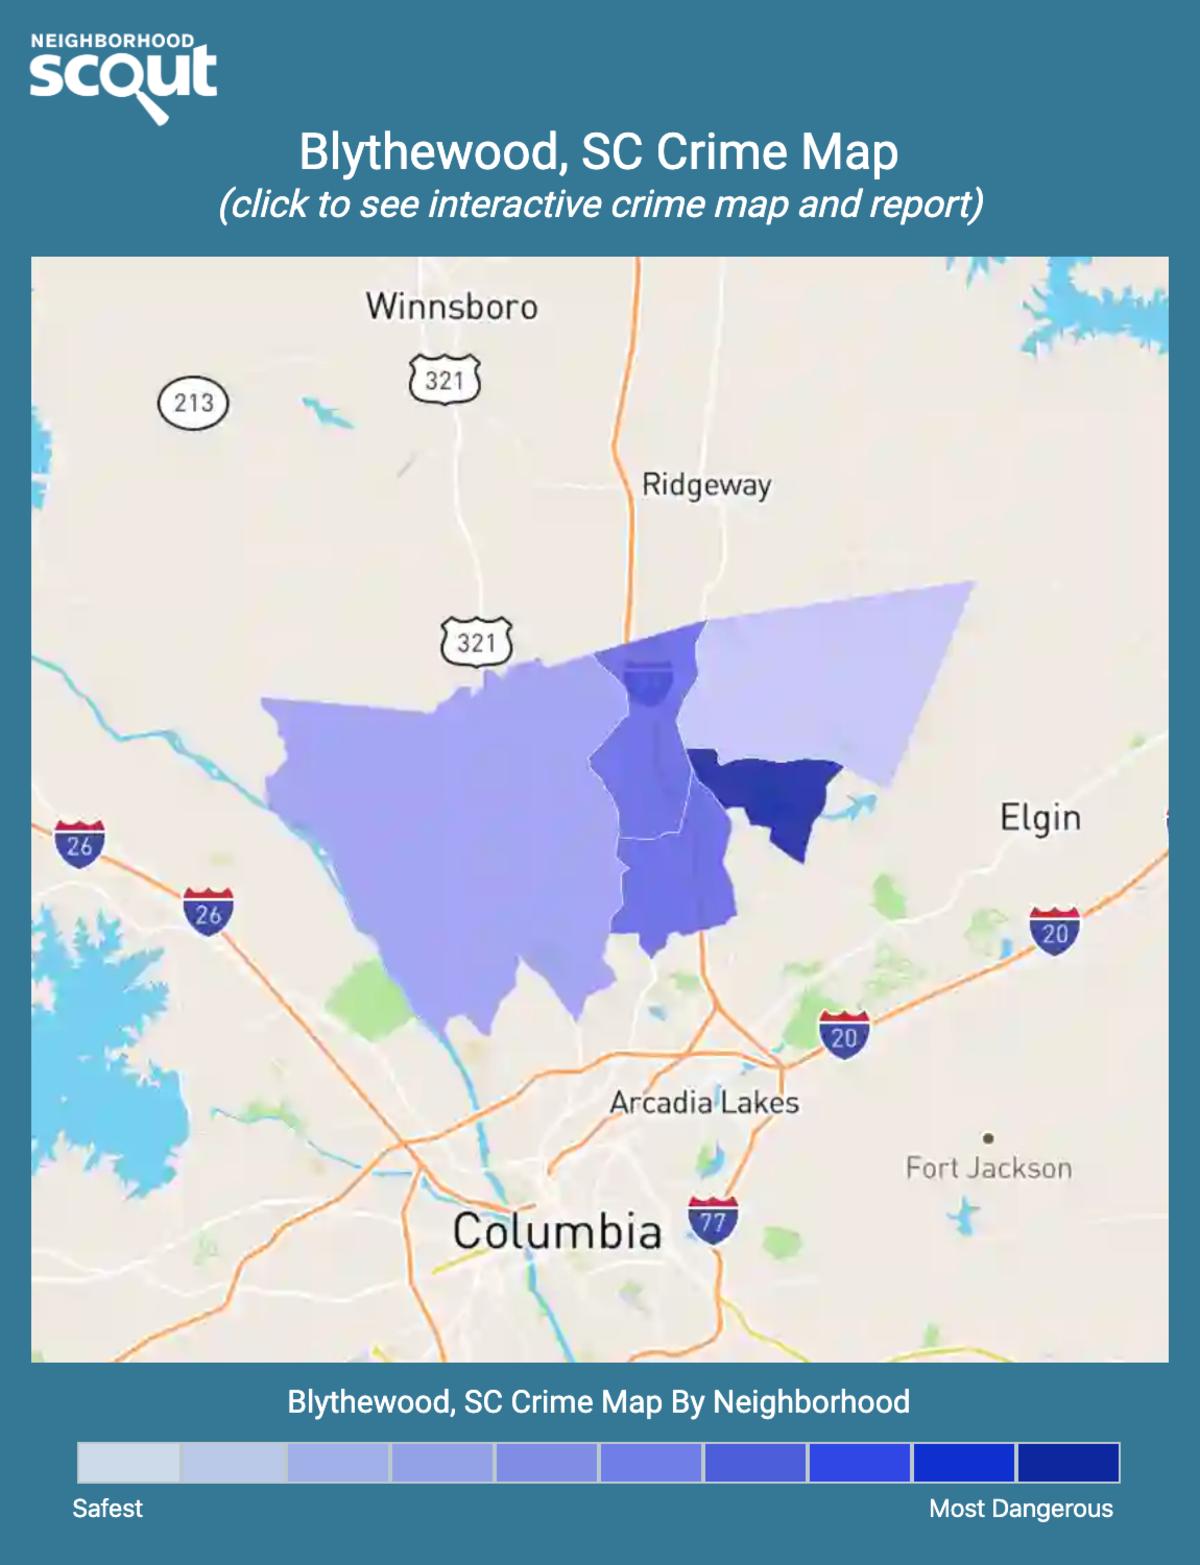 Blythewood, South Carolina crime map